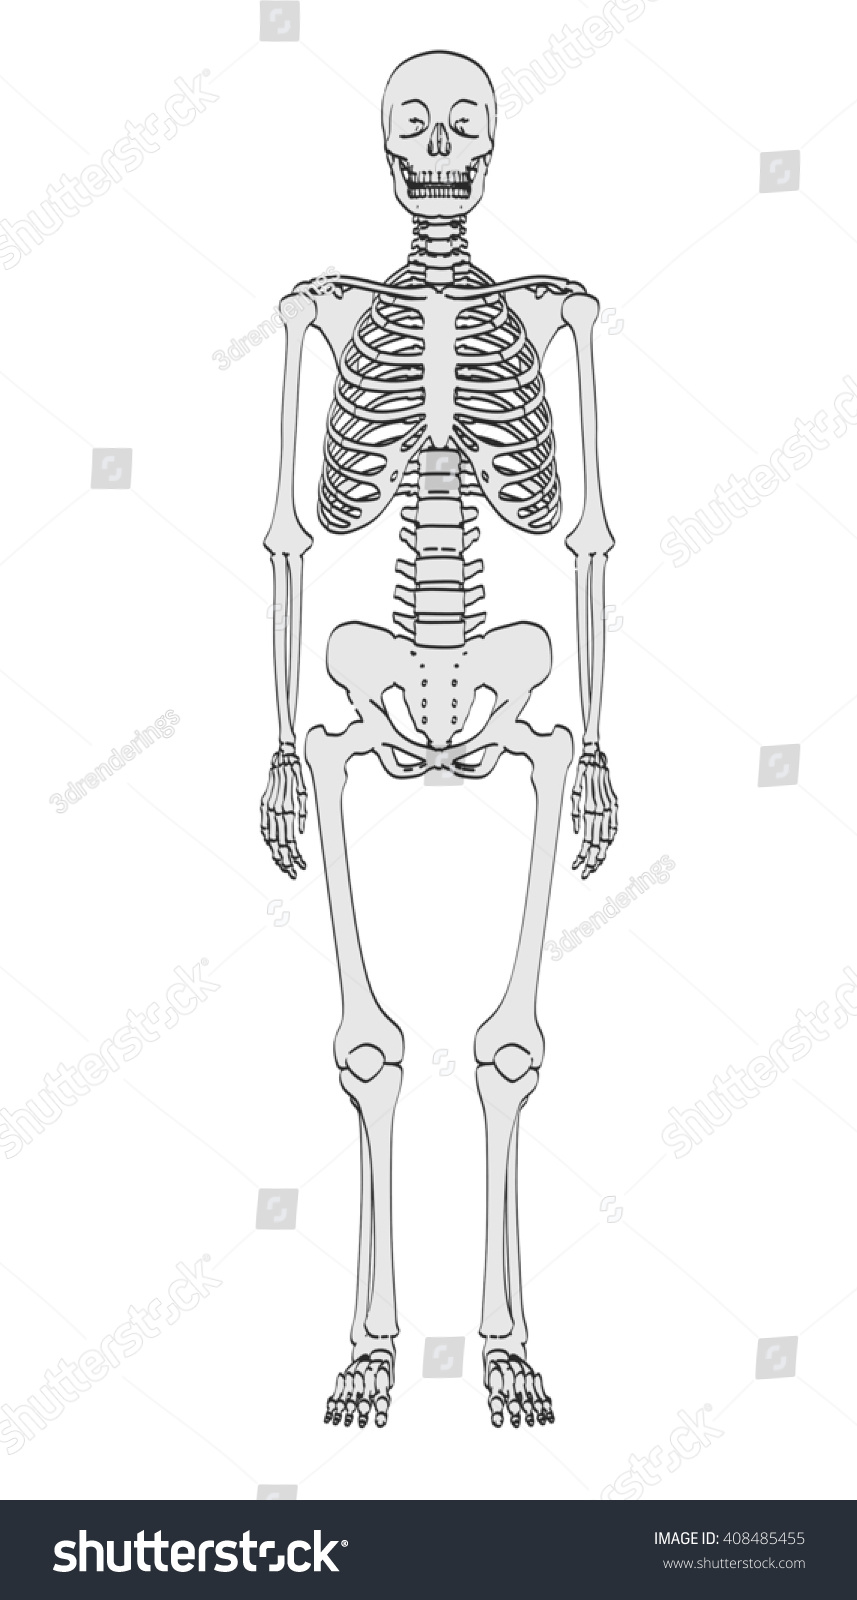 2 D Cartoon Illustration Human Skeleton Stock Illustration 408485455